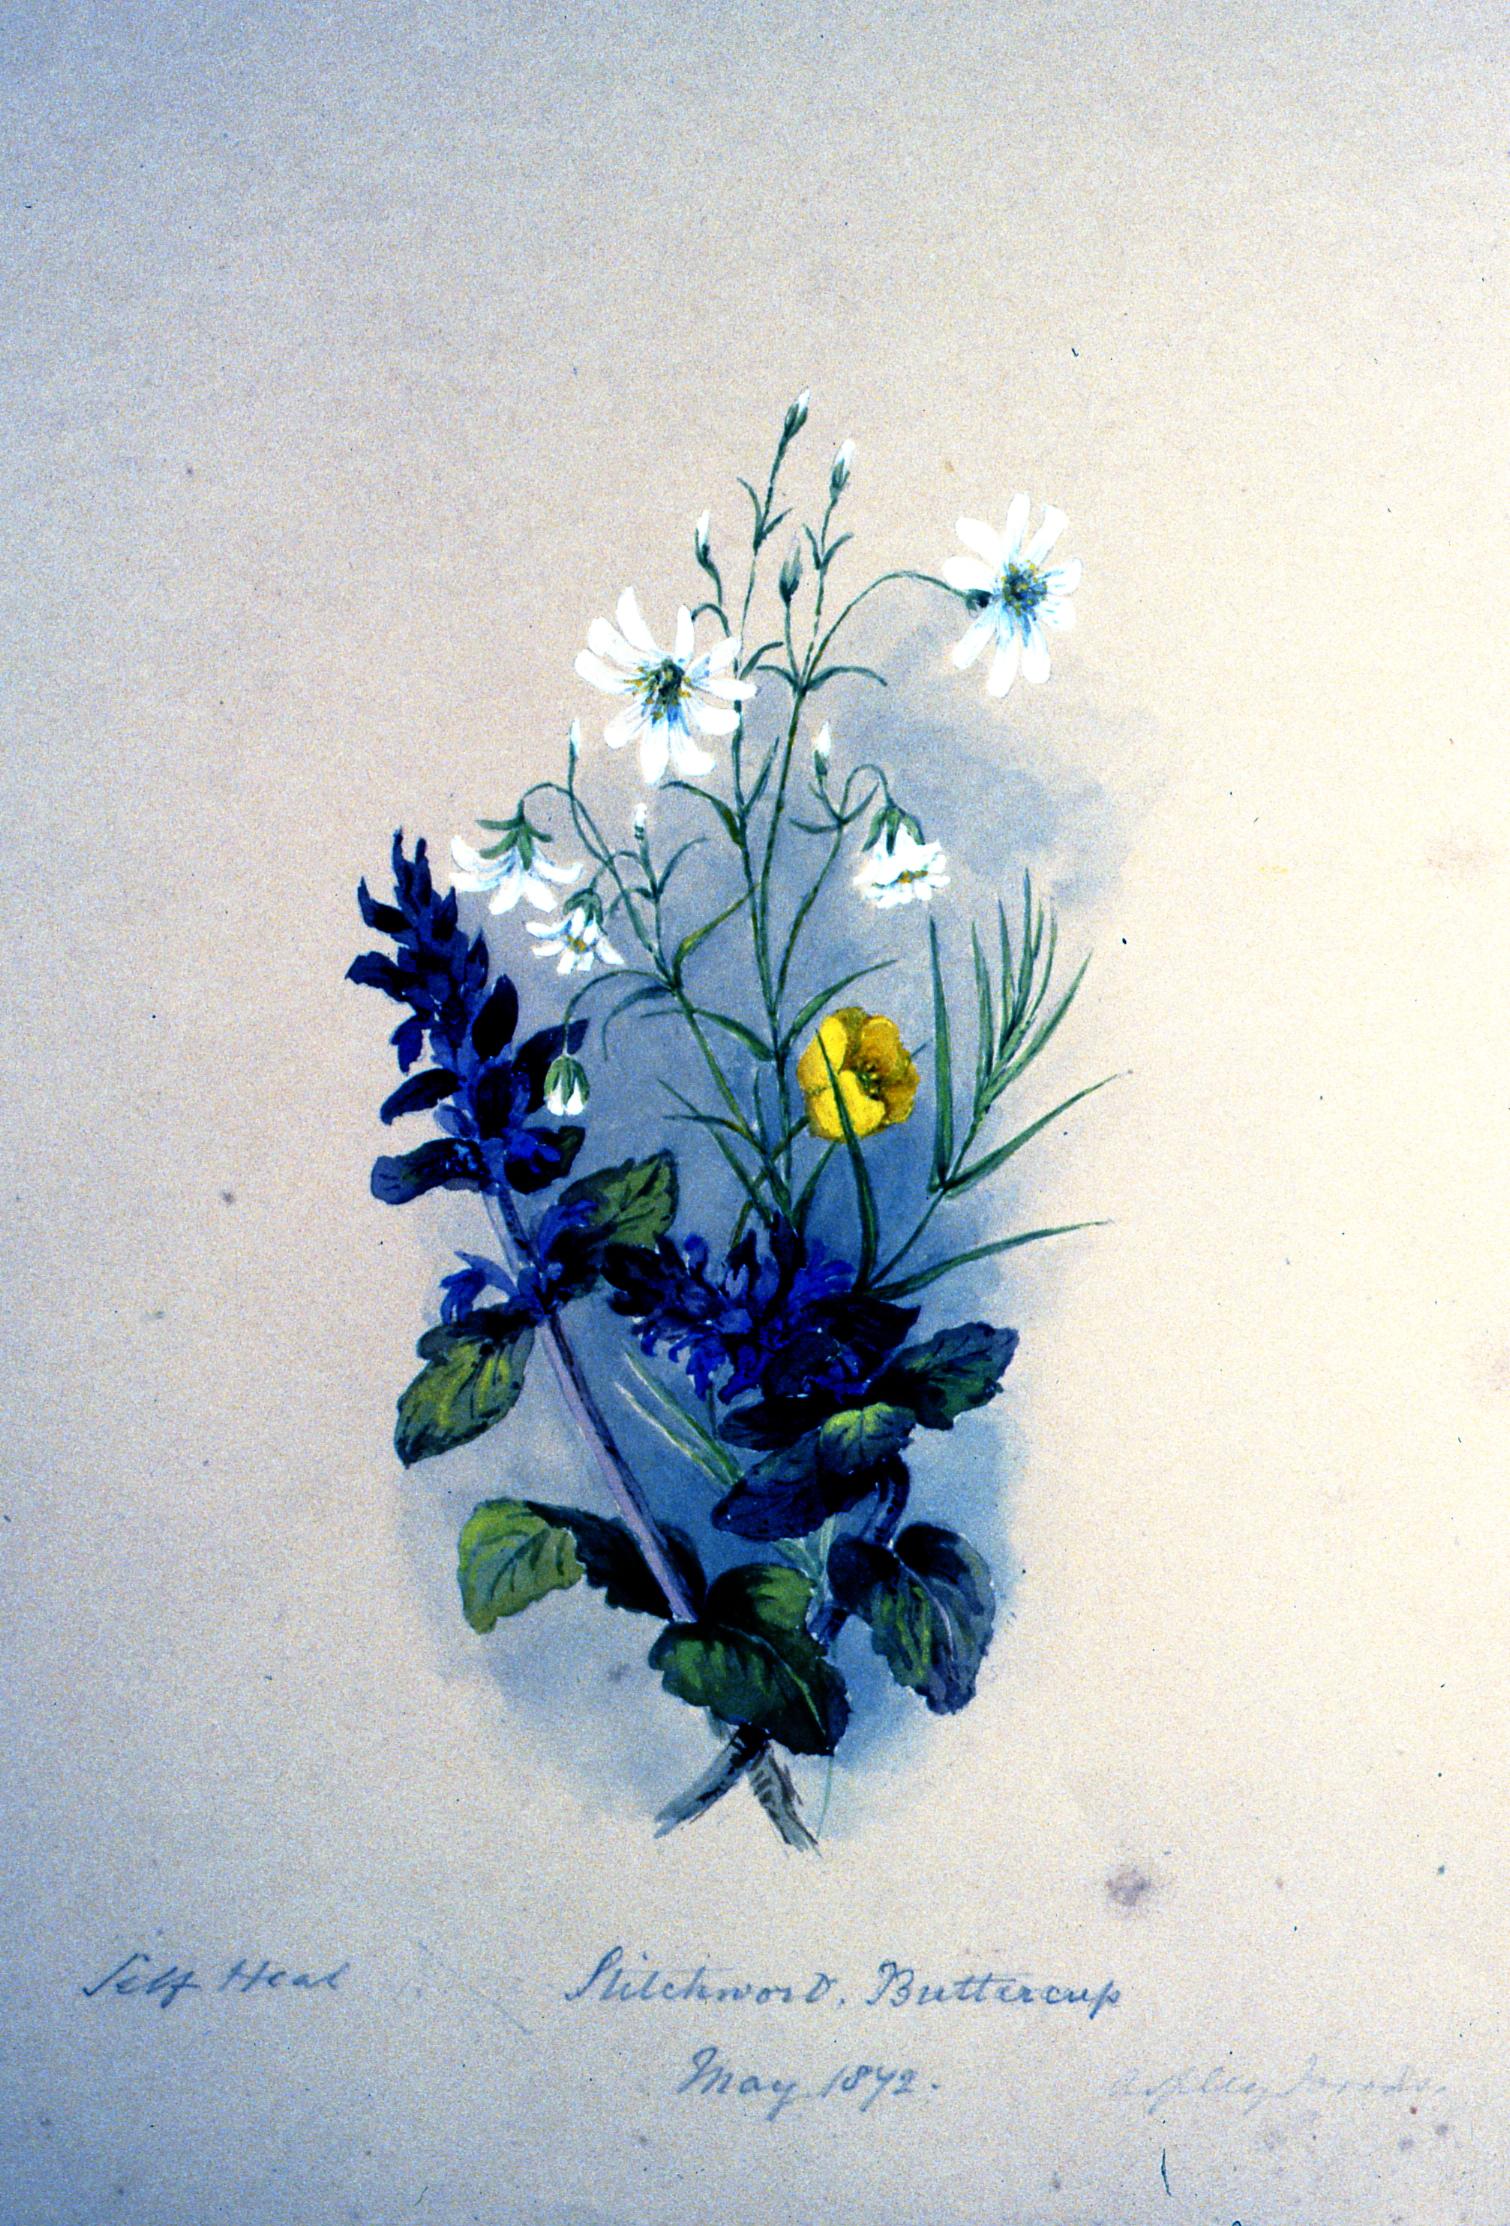 Jeff Head - Stitchwort - Buttercup , 1842, Julia Bullock-Webster, watercolour on paper, 35.5 x 25.2 cm, 1983.02.32.Gift of Mrs. Barbara Steel.